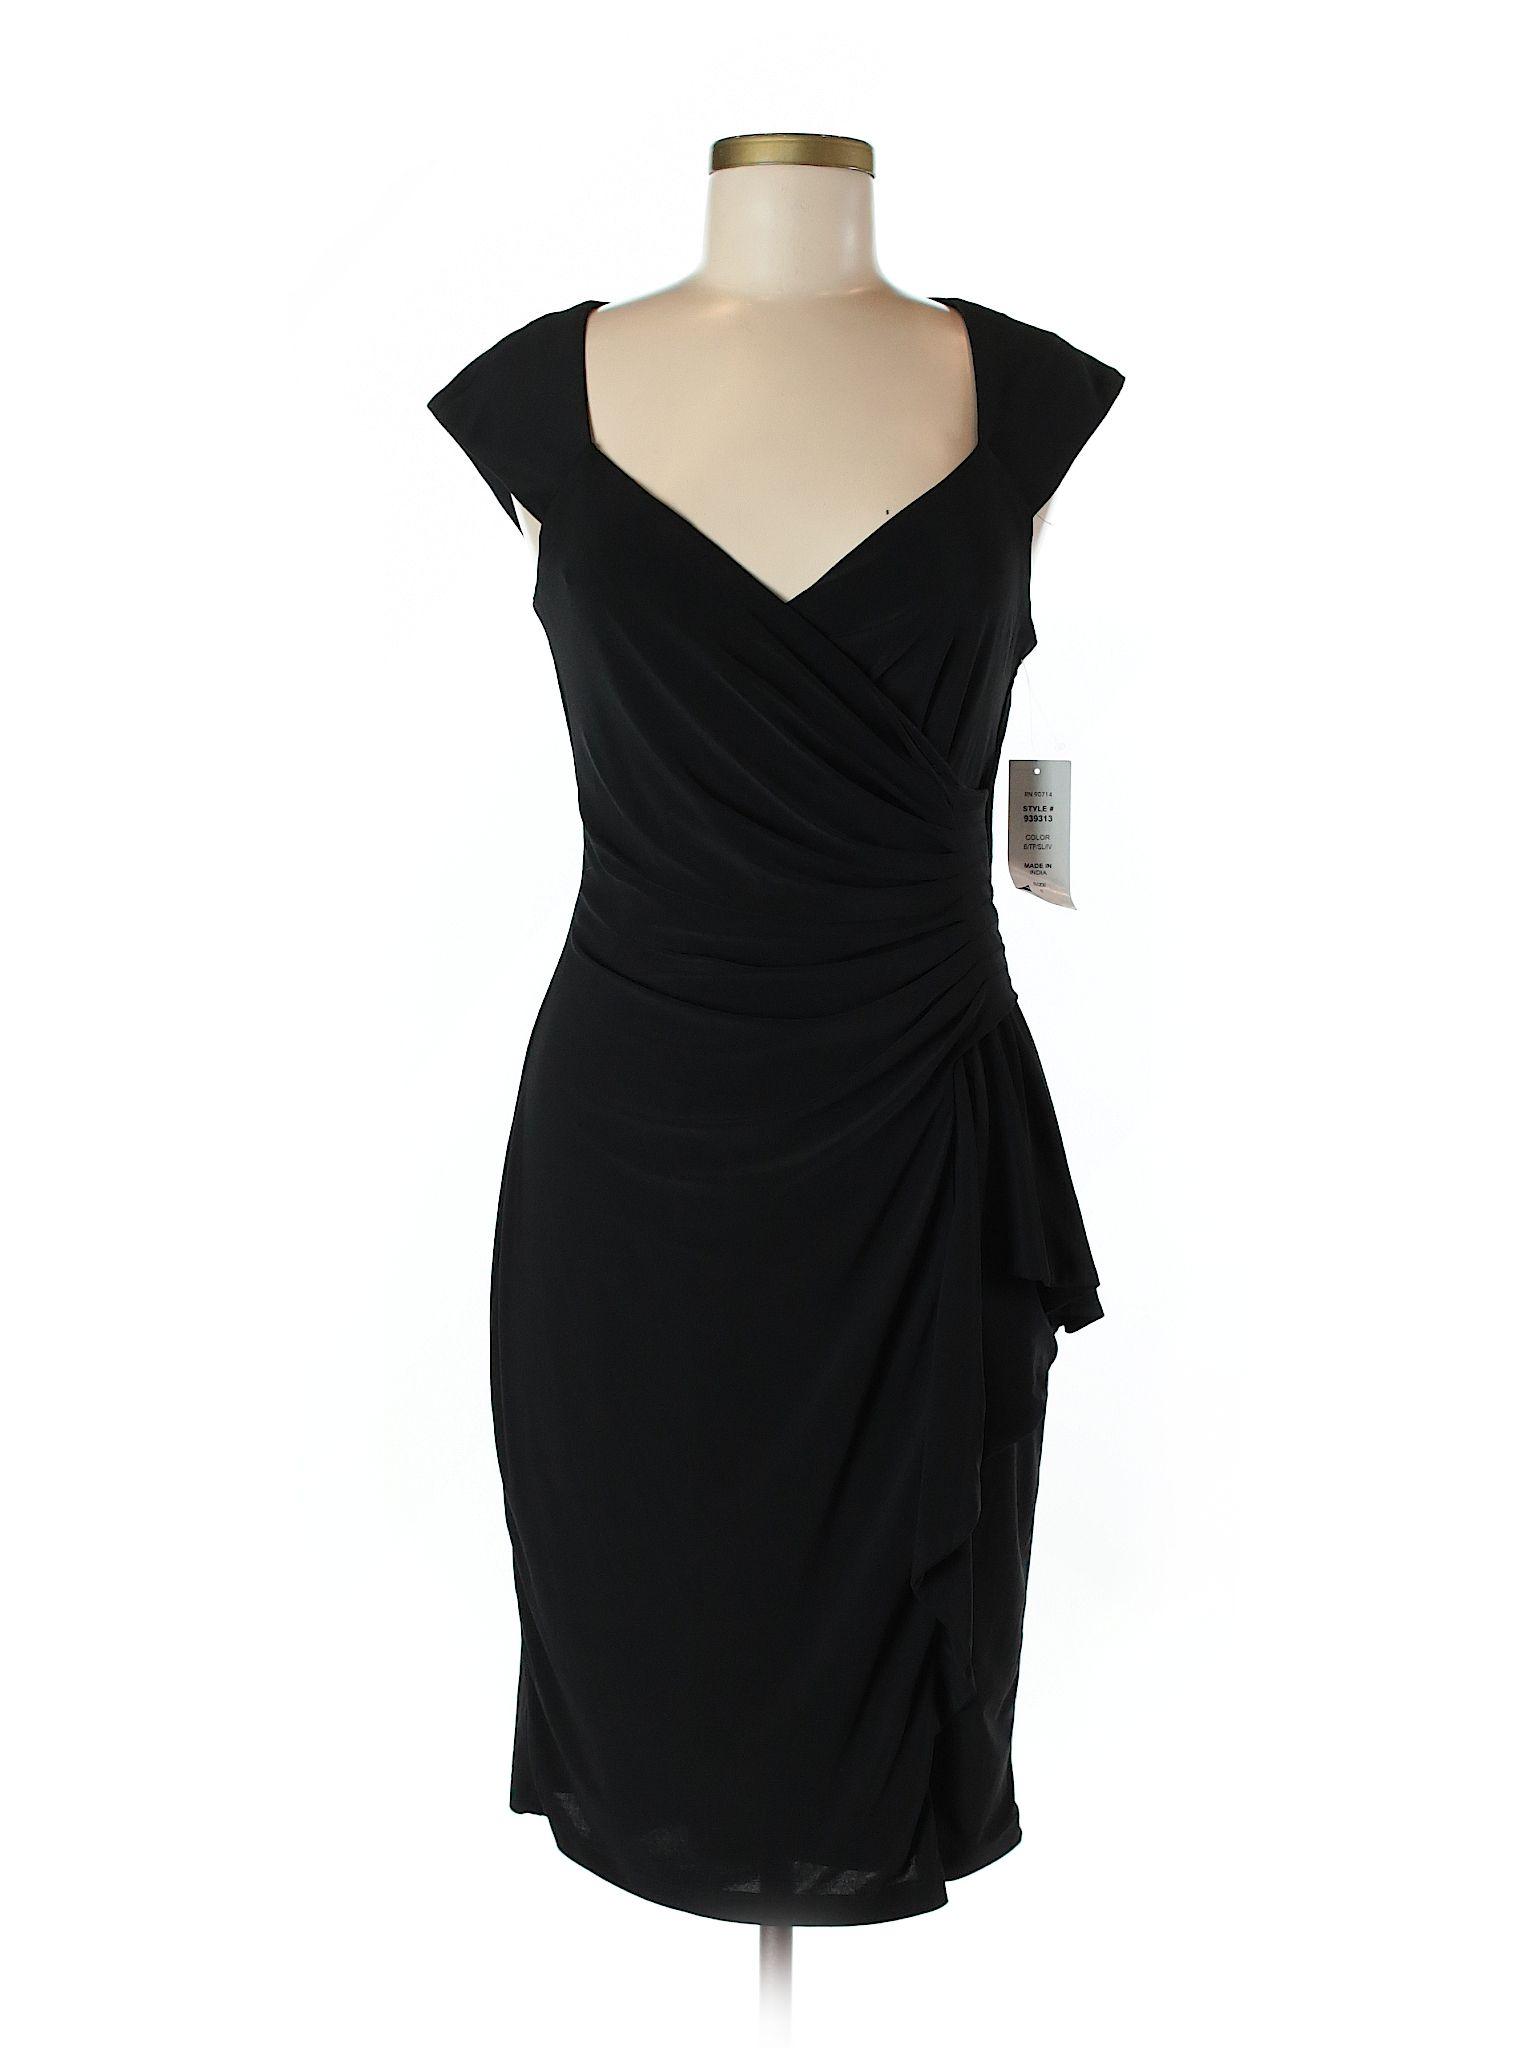 Msk Casual Dress Size 600 Black Womens Dresses  New